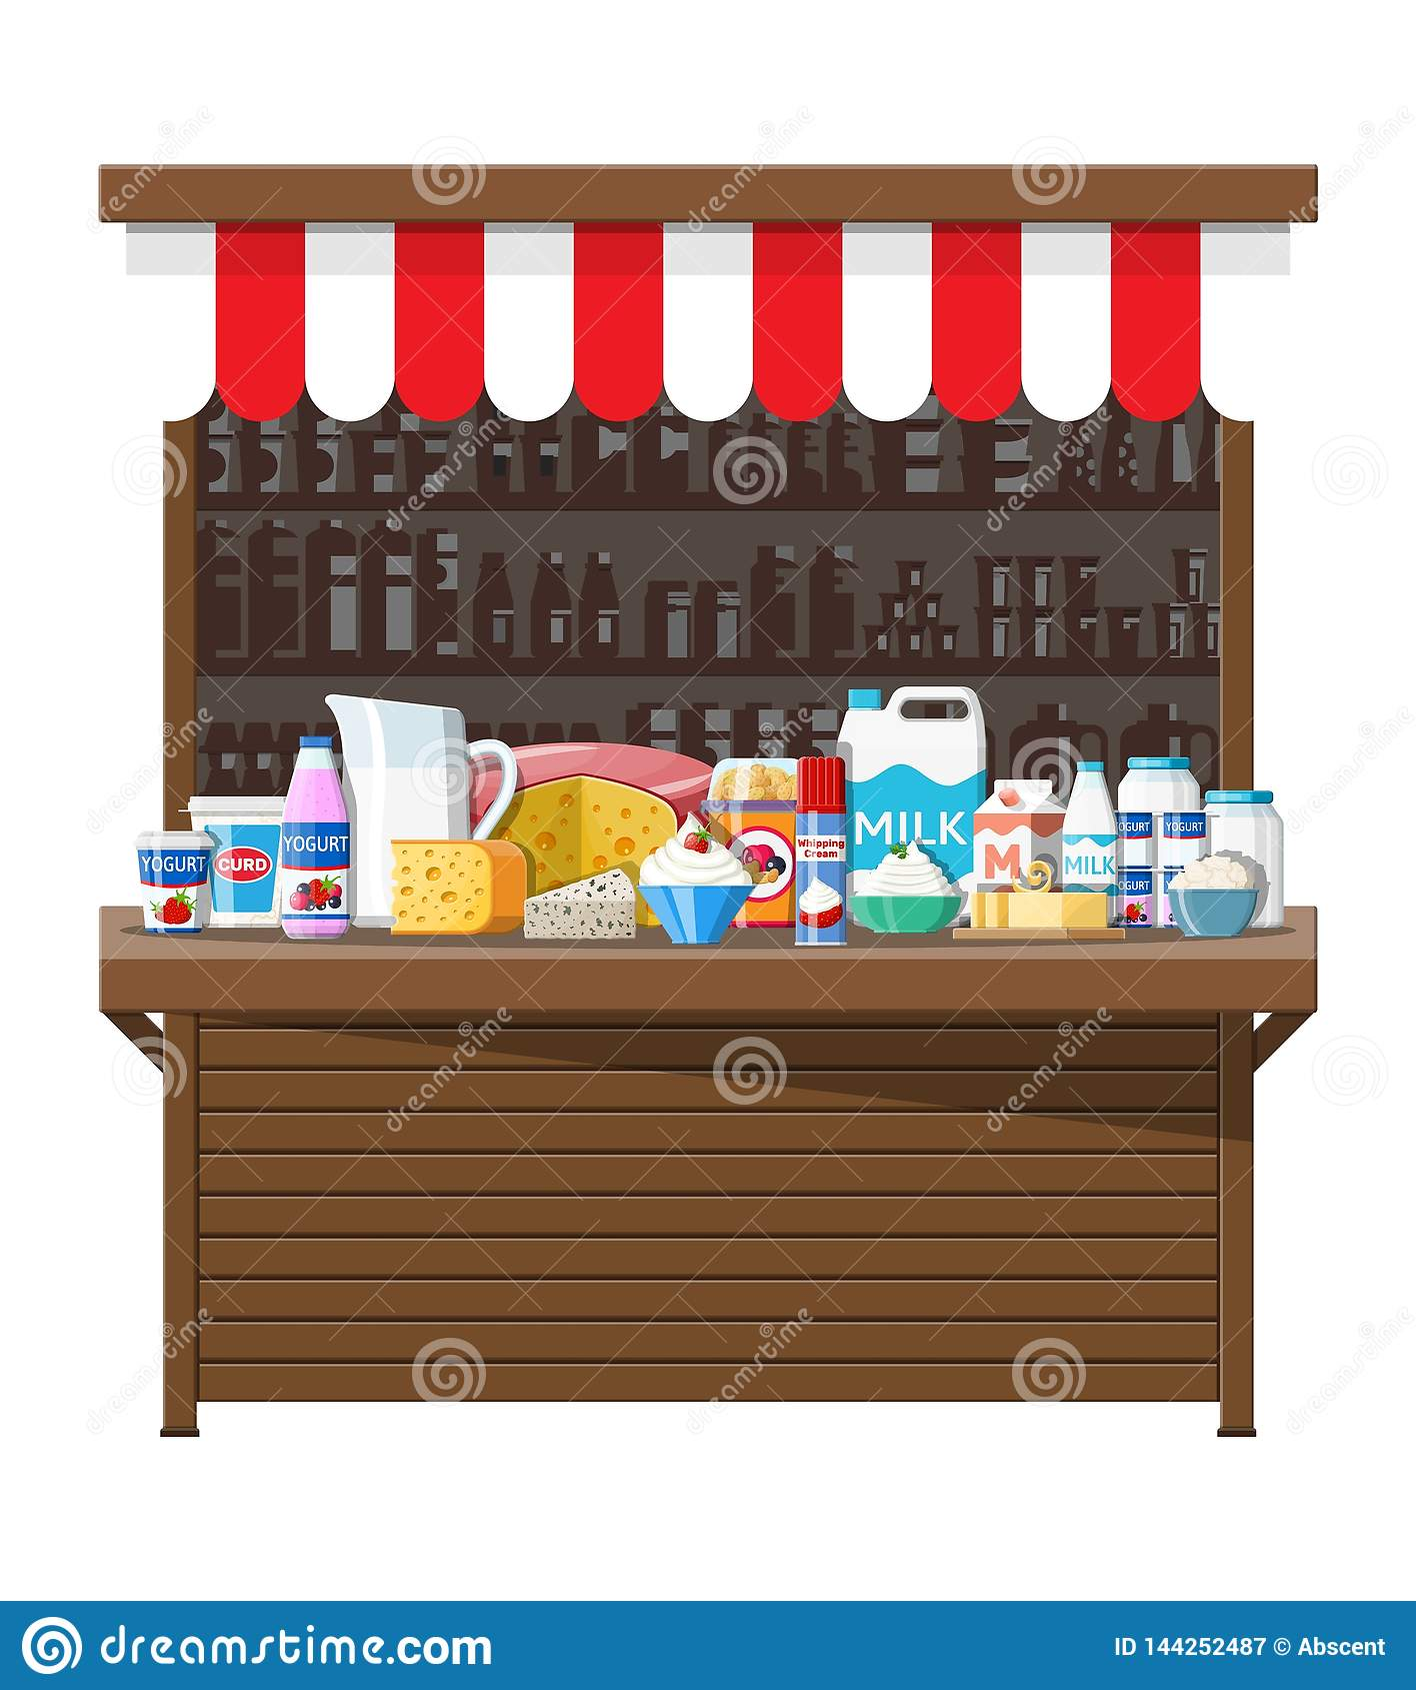 Milk Street Market  Milk Store Stall  Stock Vector - Illustration of